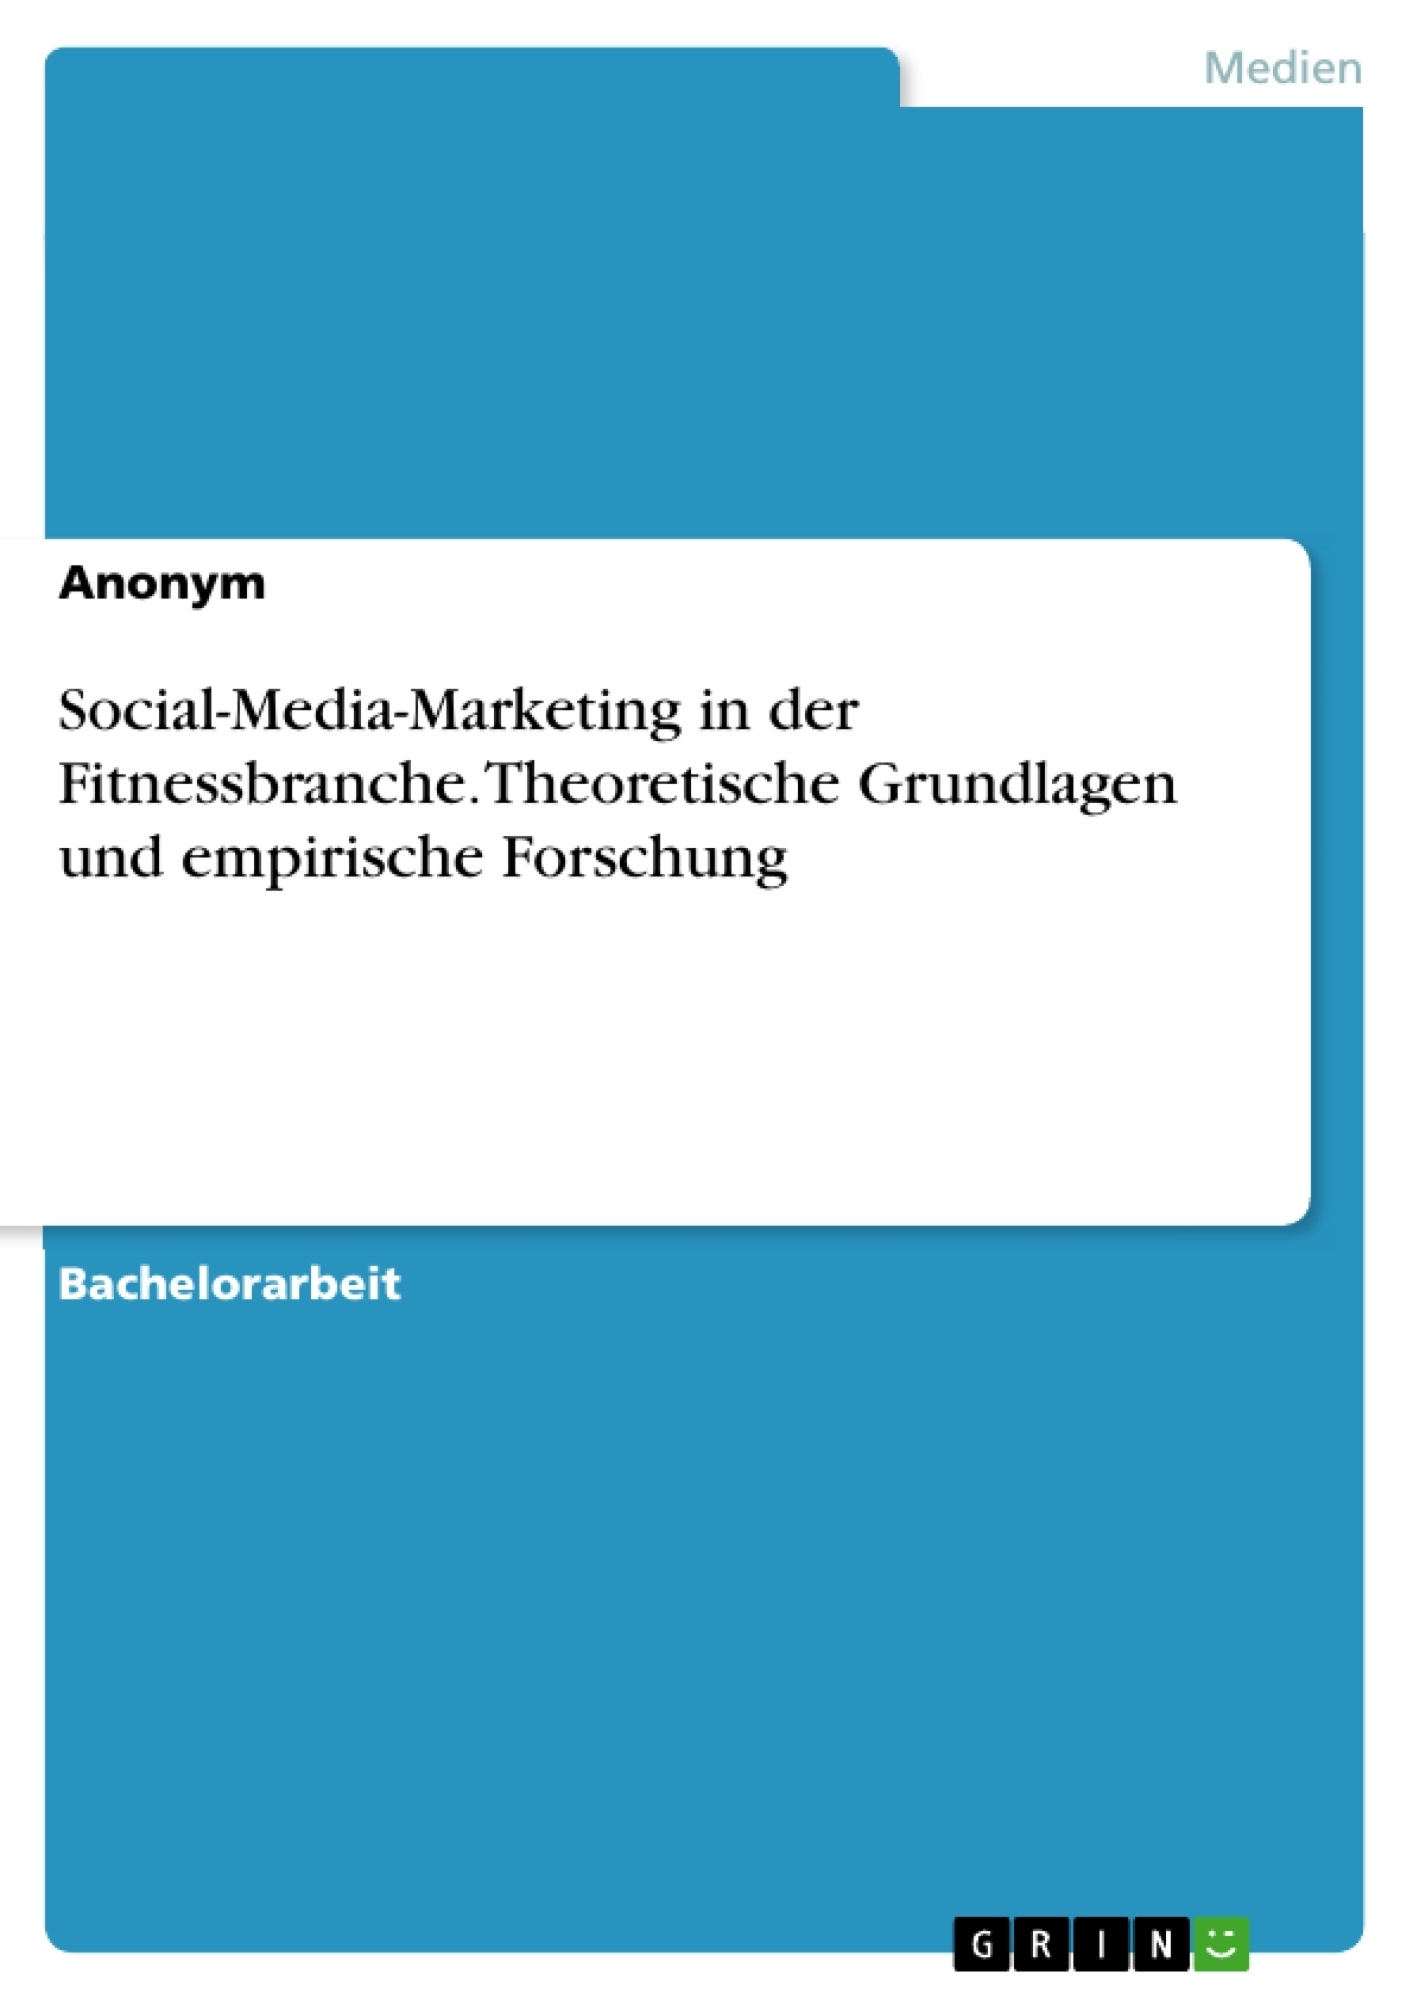 Master thesis social media marketing